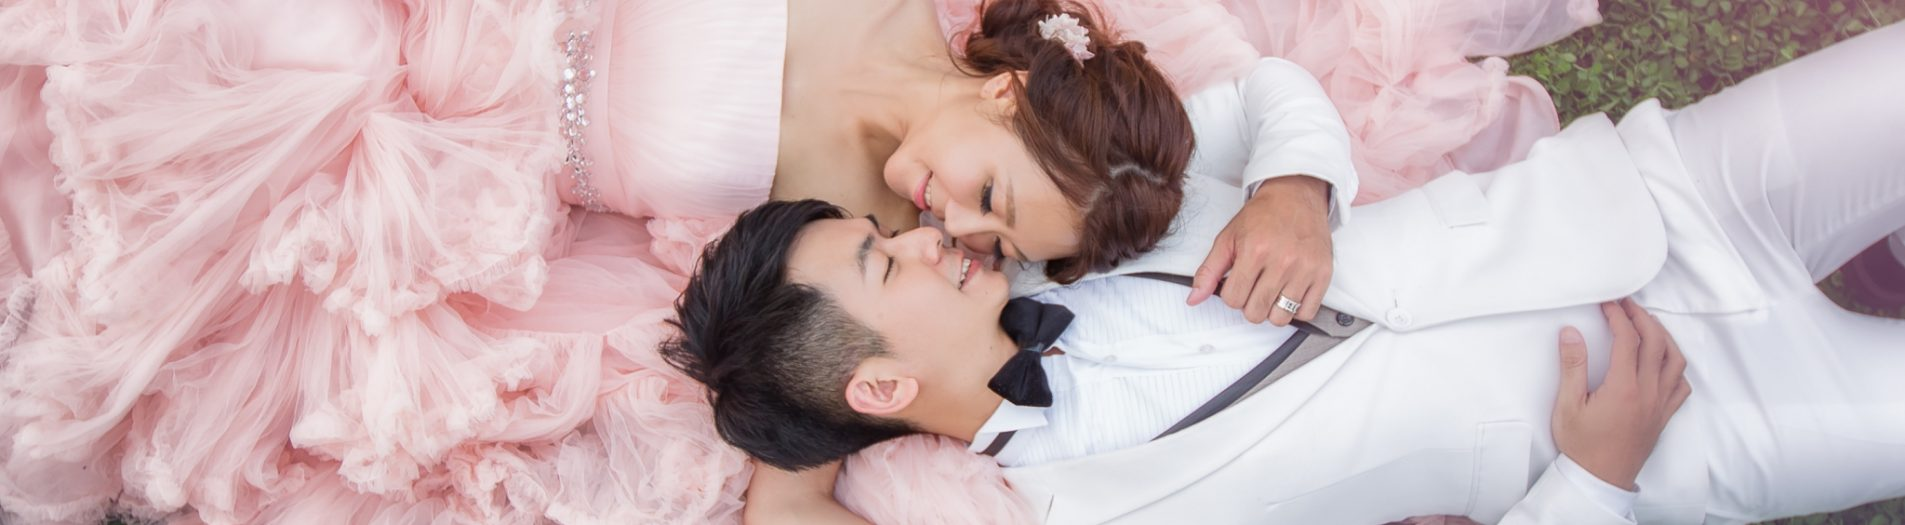 PRE WEDDING 精選作品